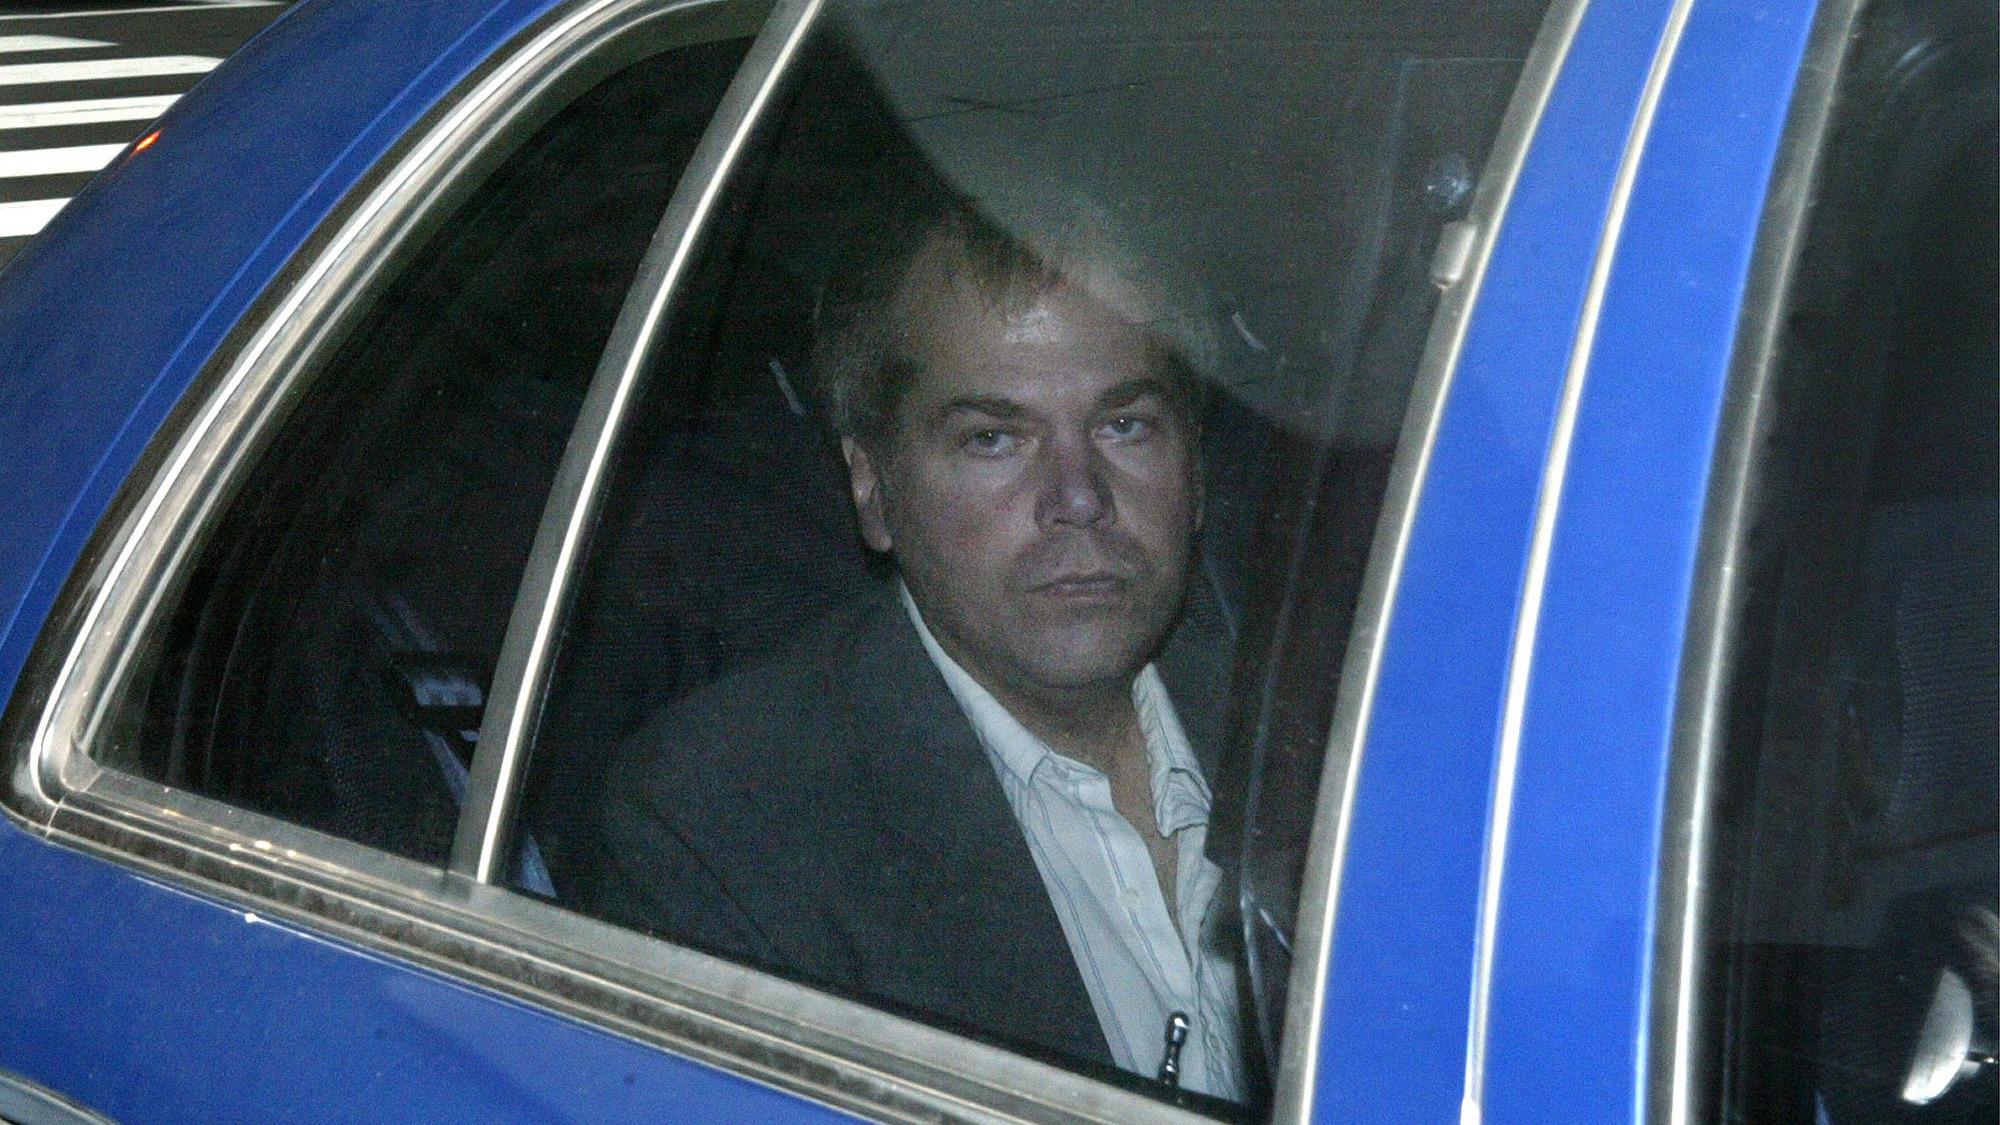 Man Who Shot Reagan Seeks Release From Mental Hospital